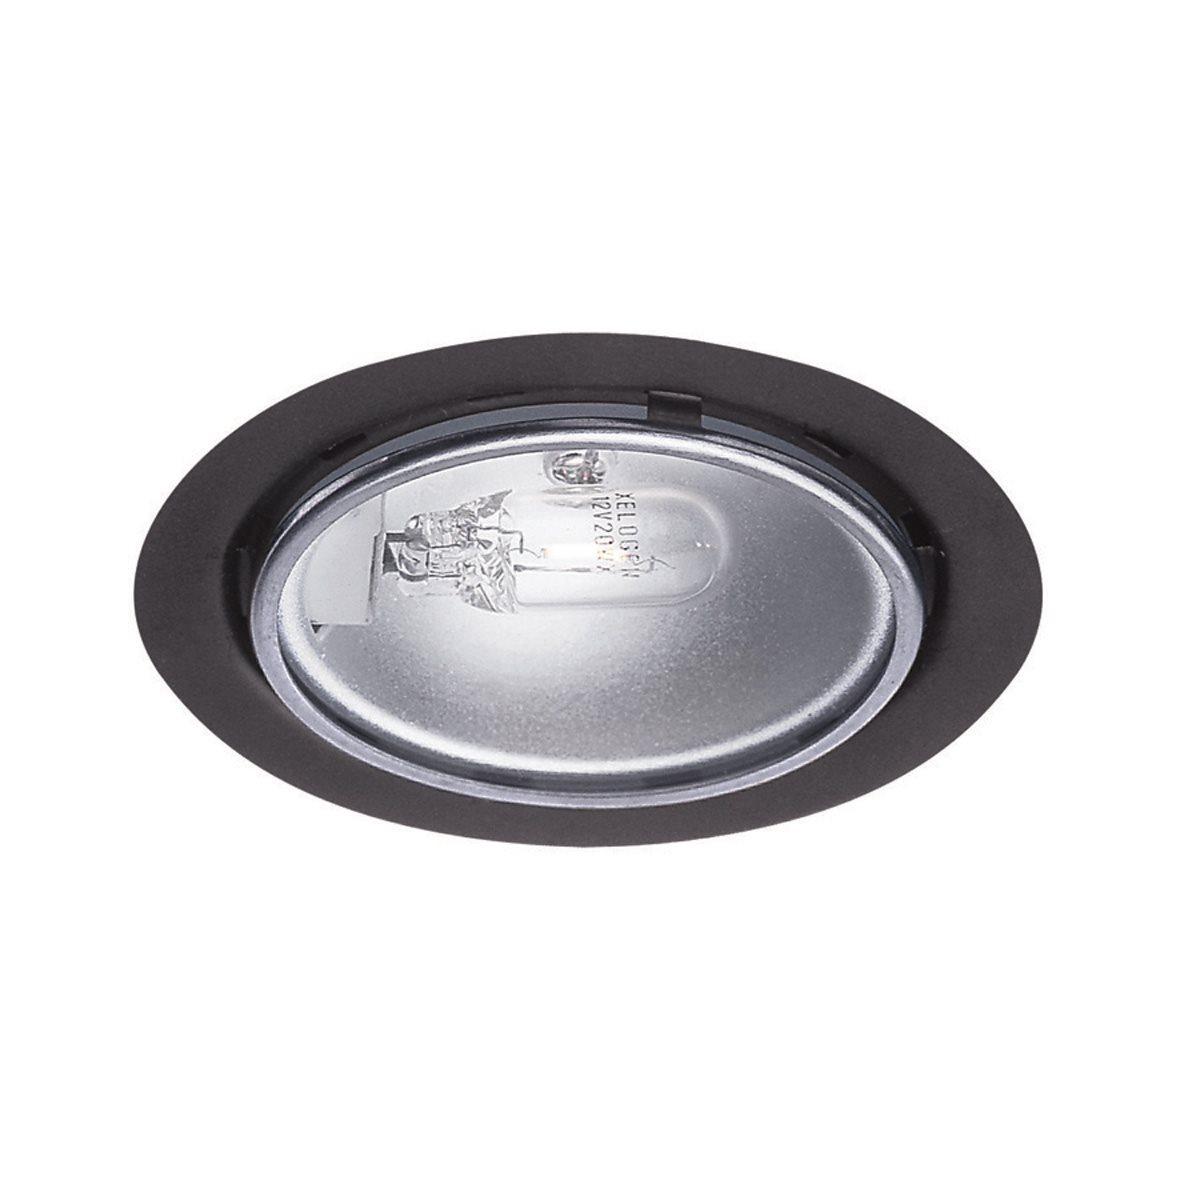 W A C Lighting Hr 86 20w 12v Low Voltage Xenon Button